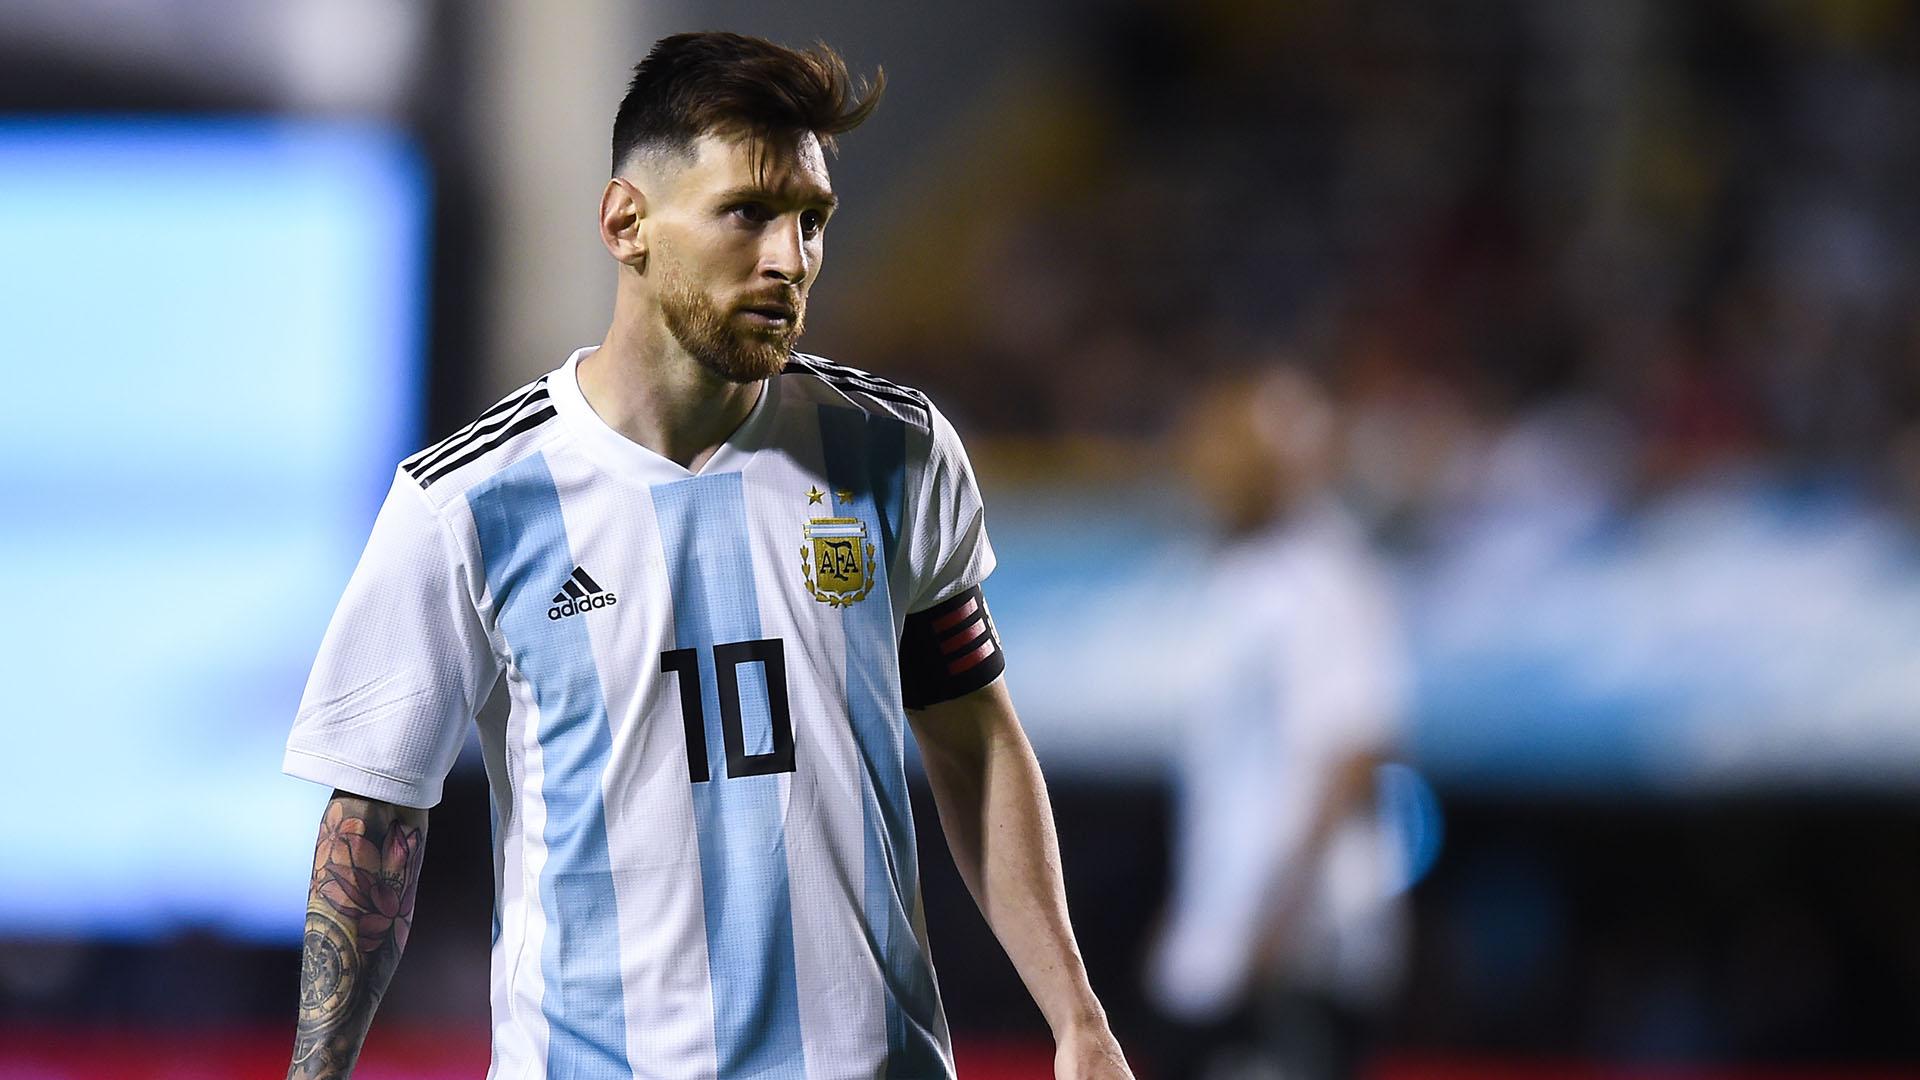 Video: Messi's Argentina arrive in Russia